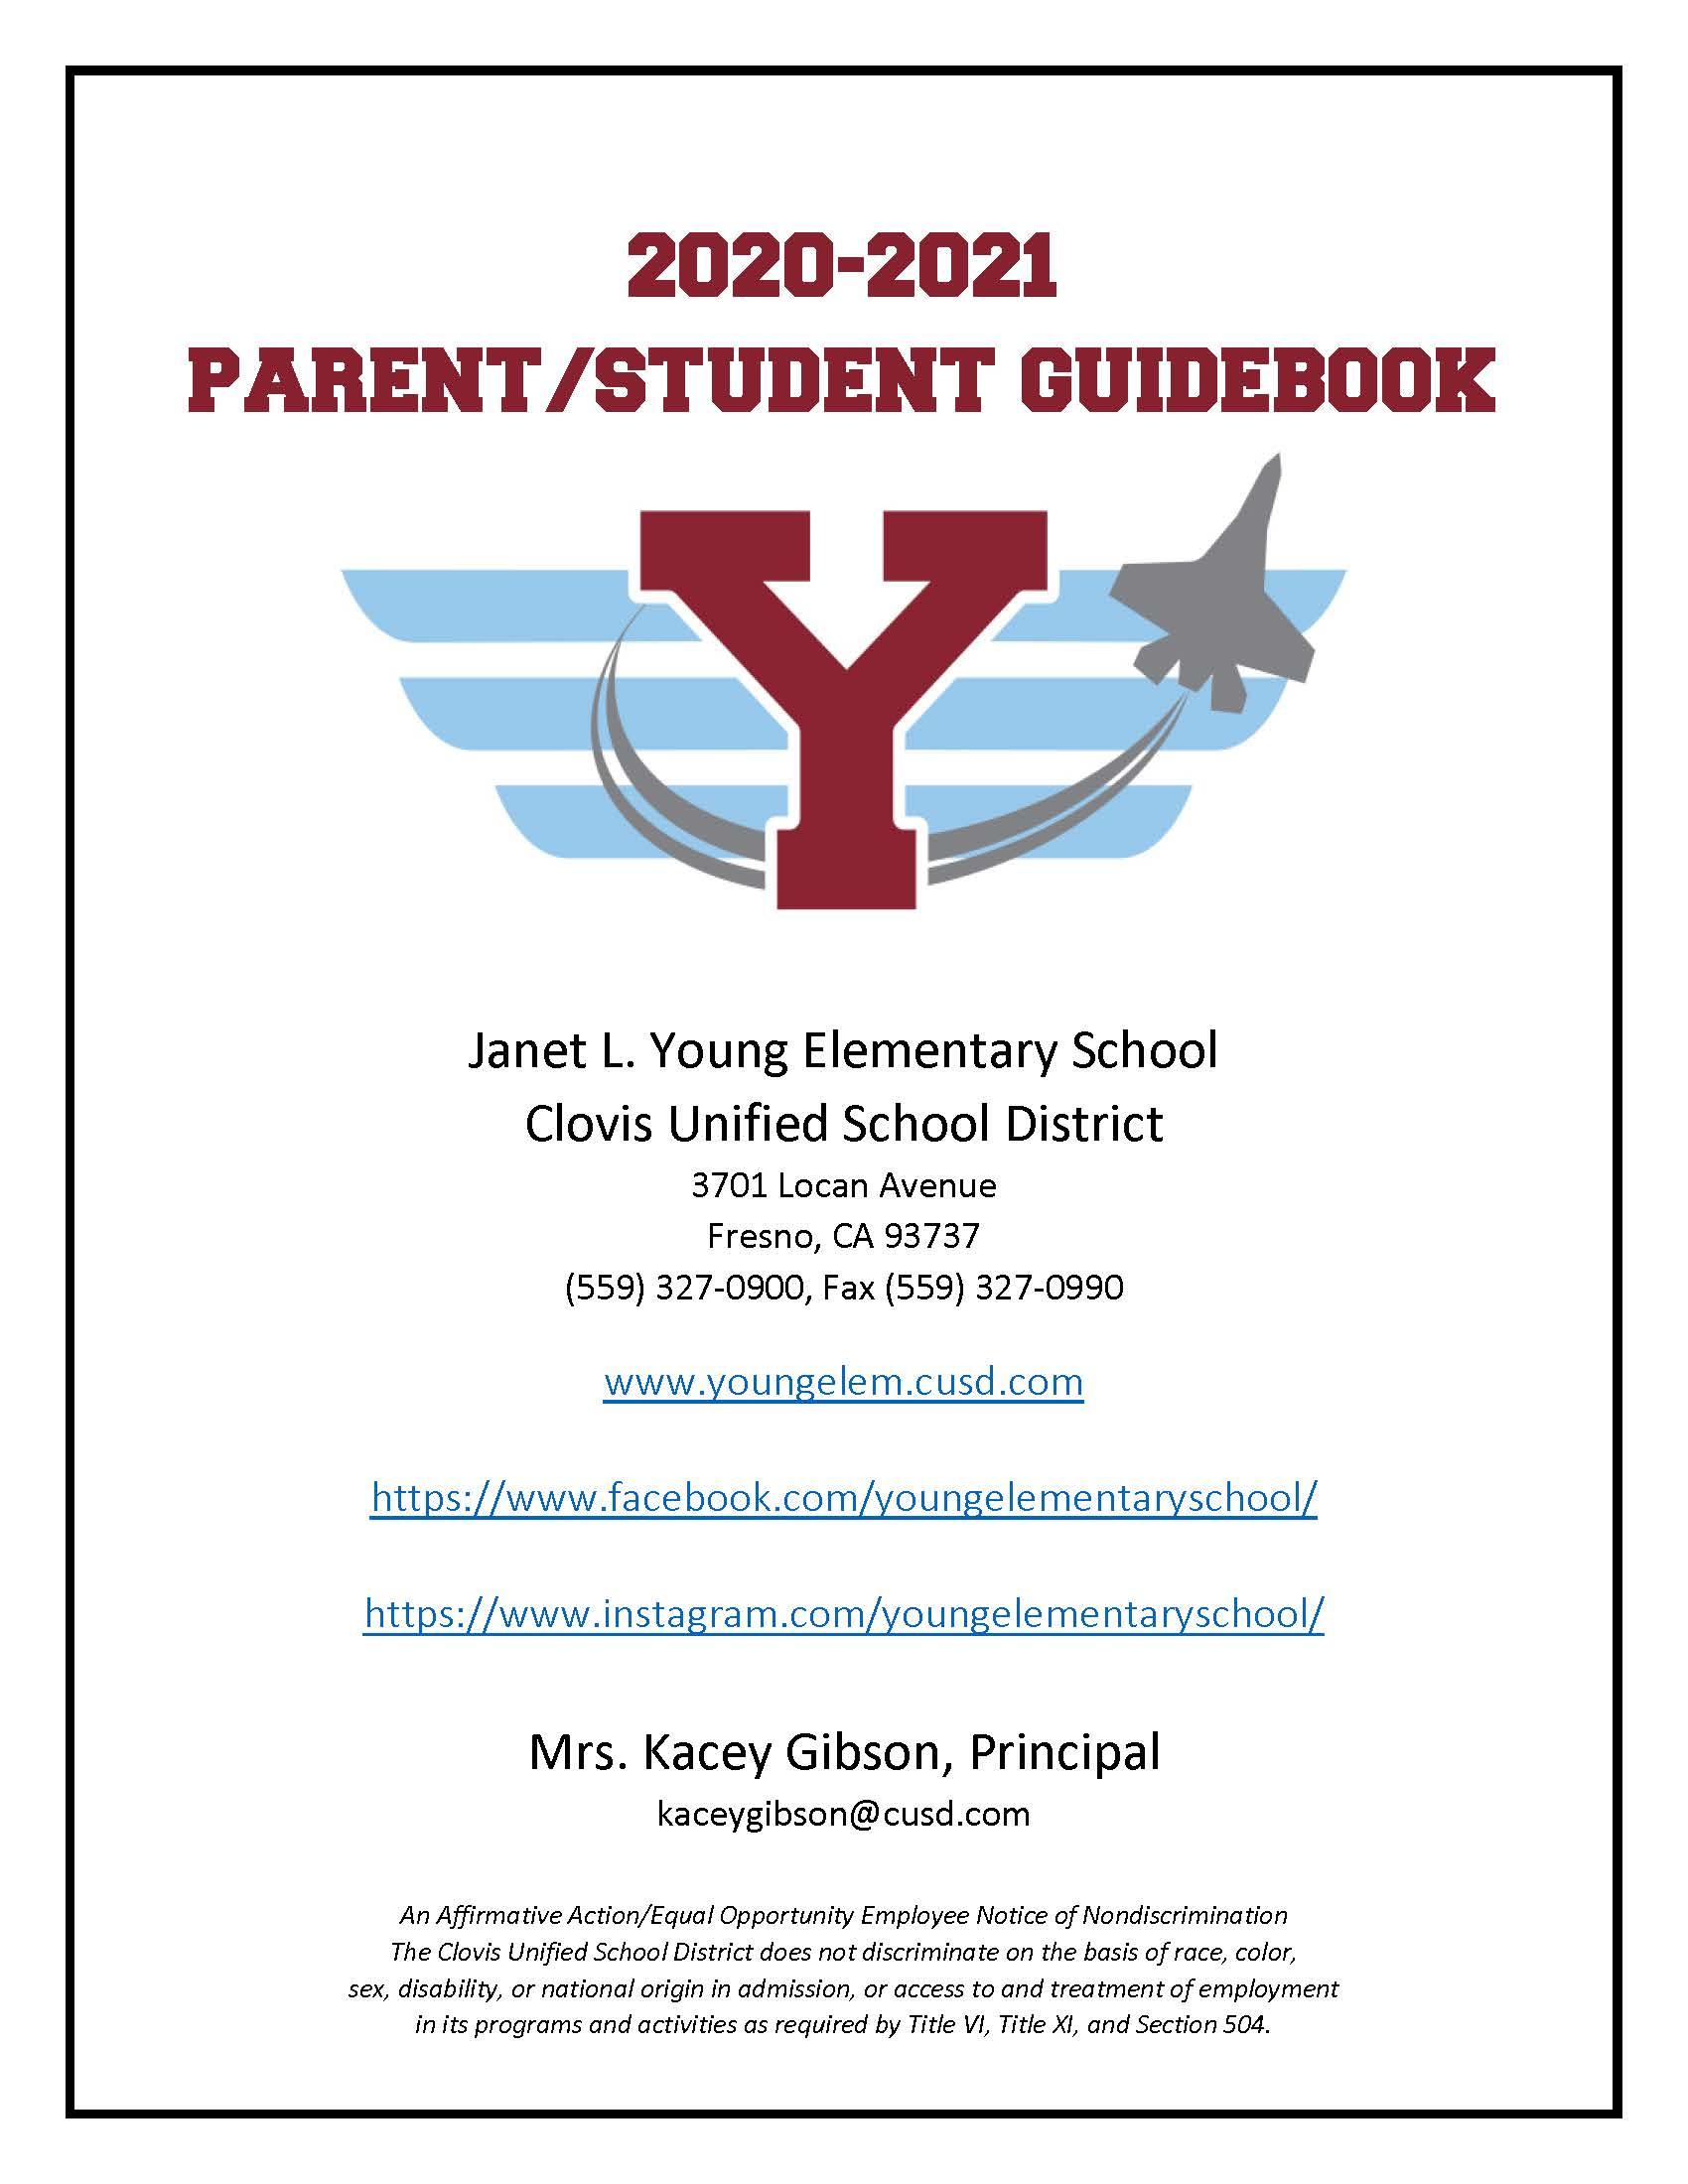 2020-21 YES Parent Handbook